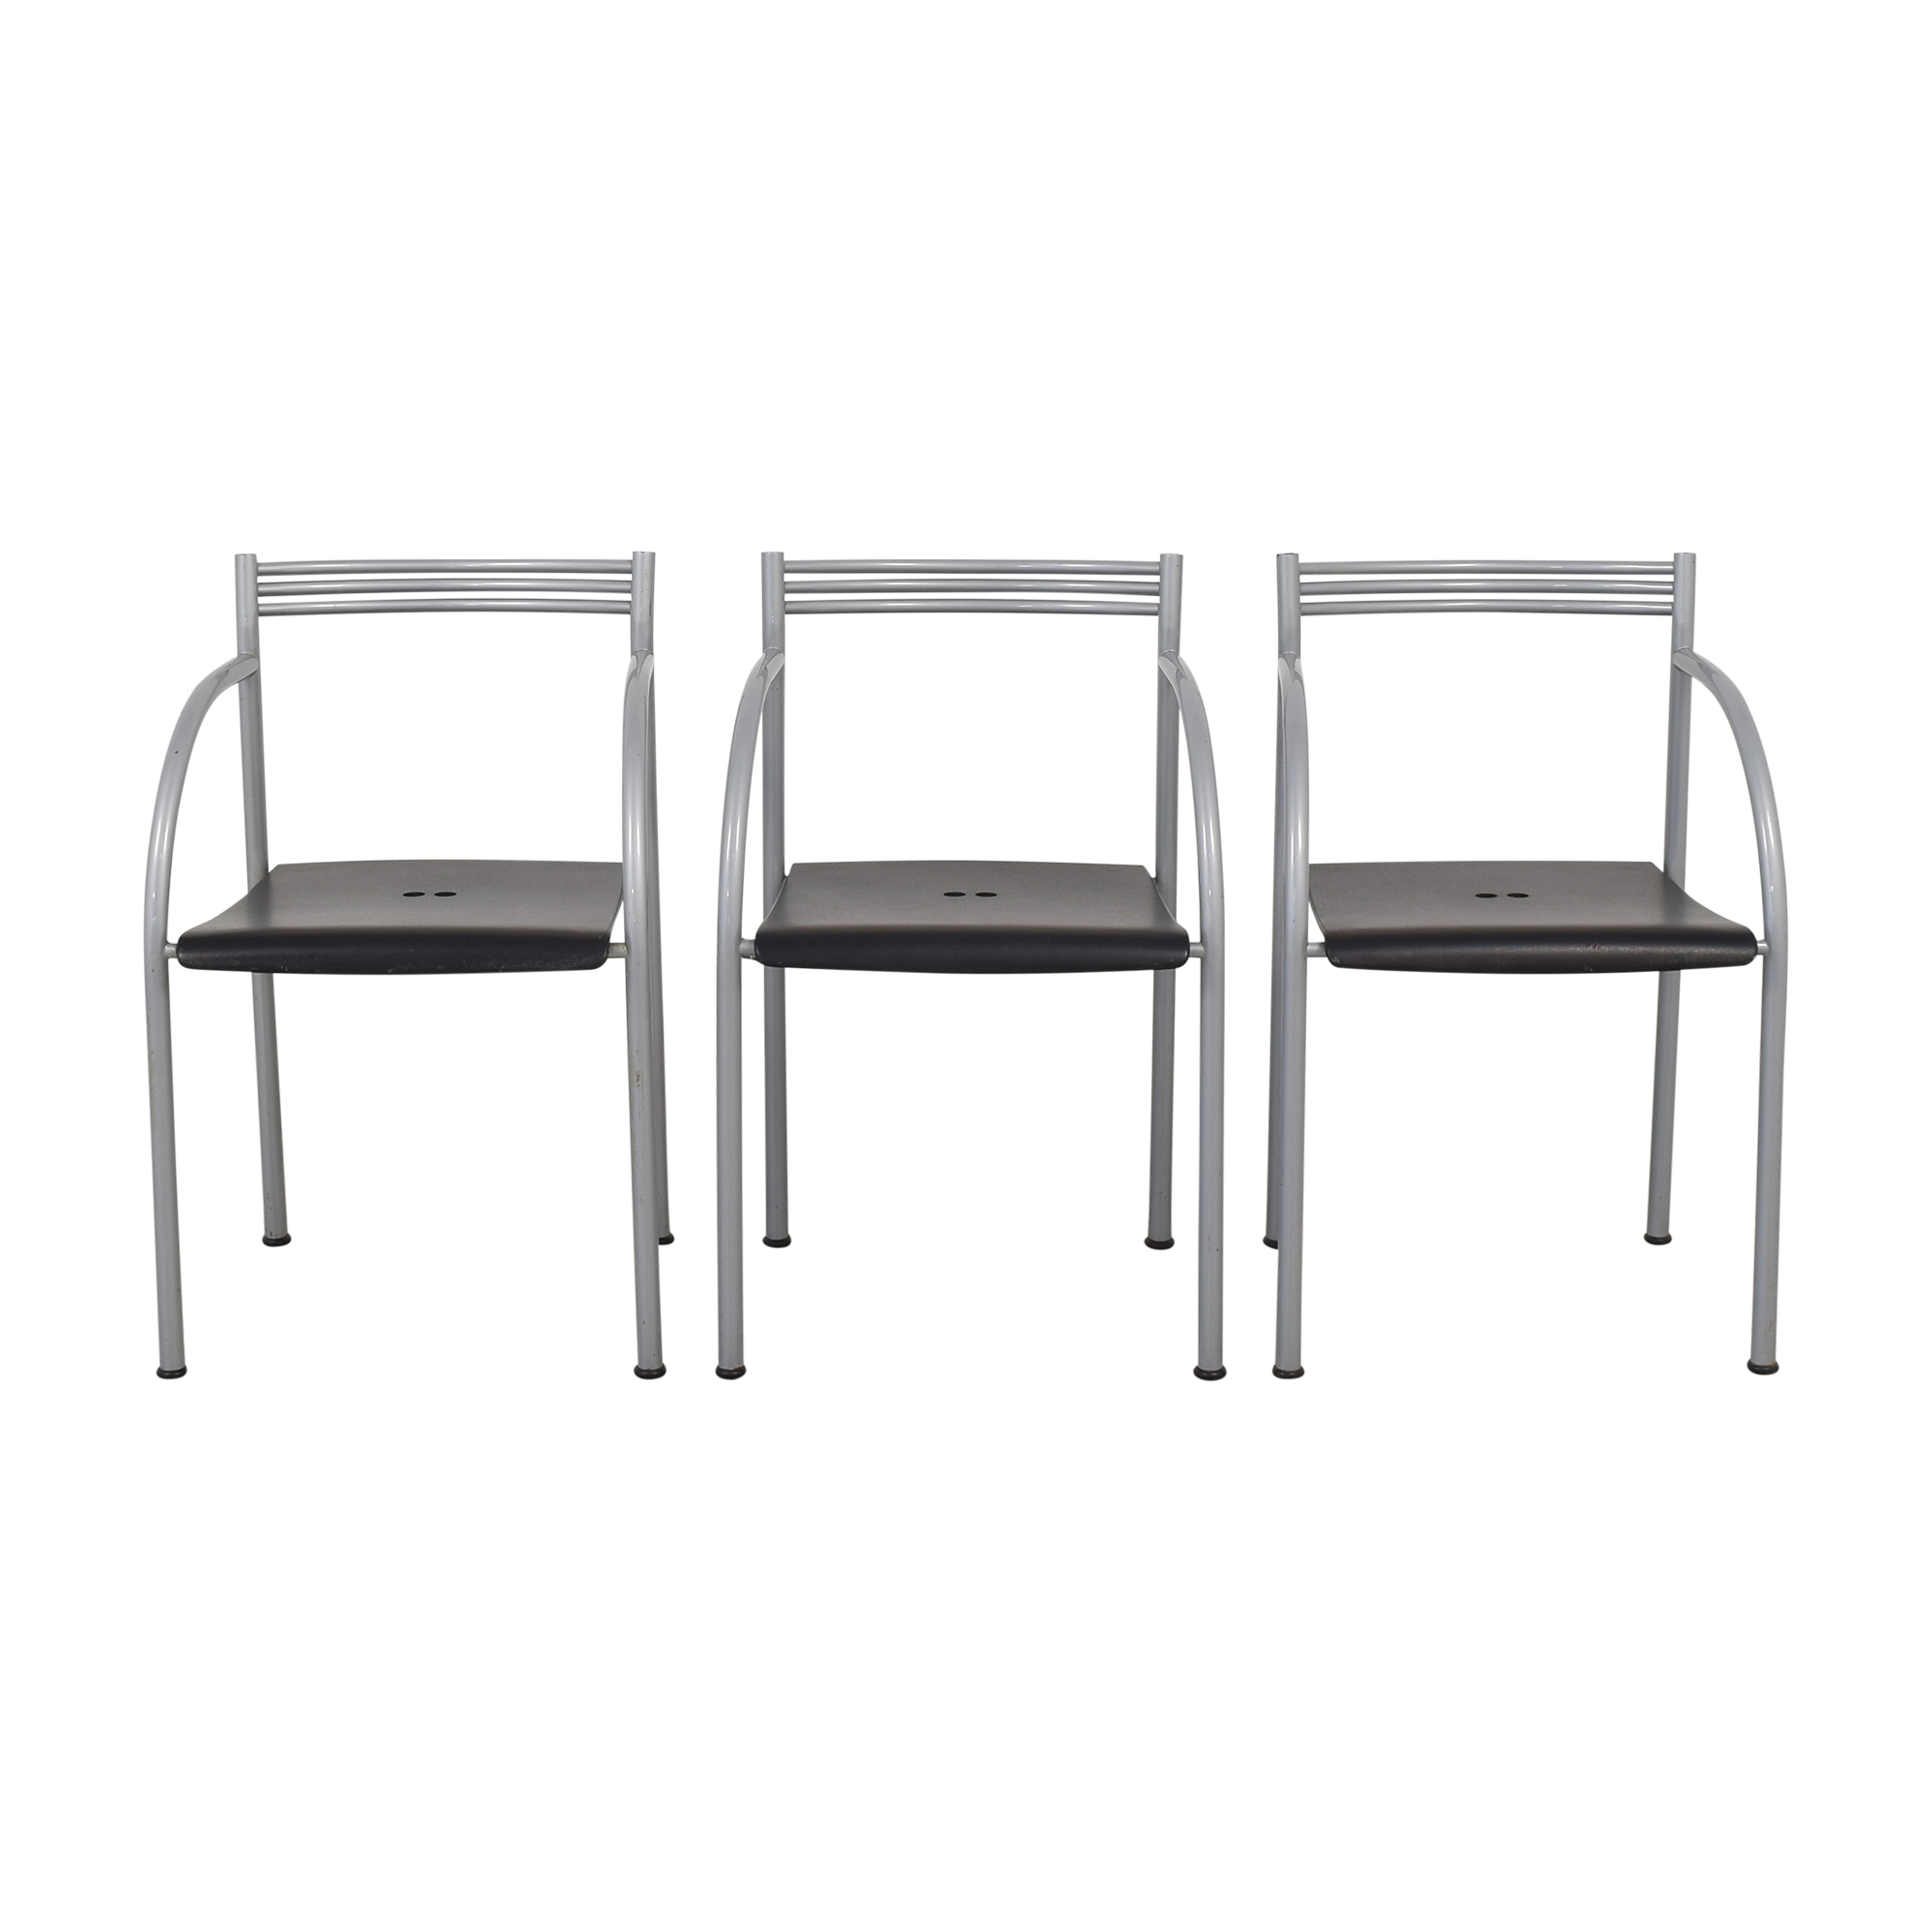 Baleri Italia Baleri Italia Starck Chairs used